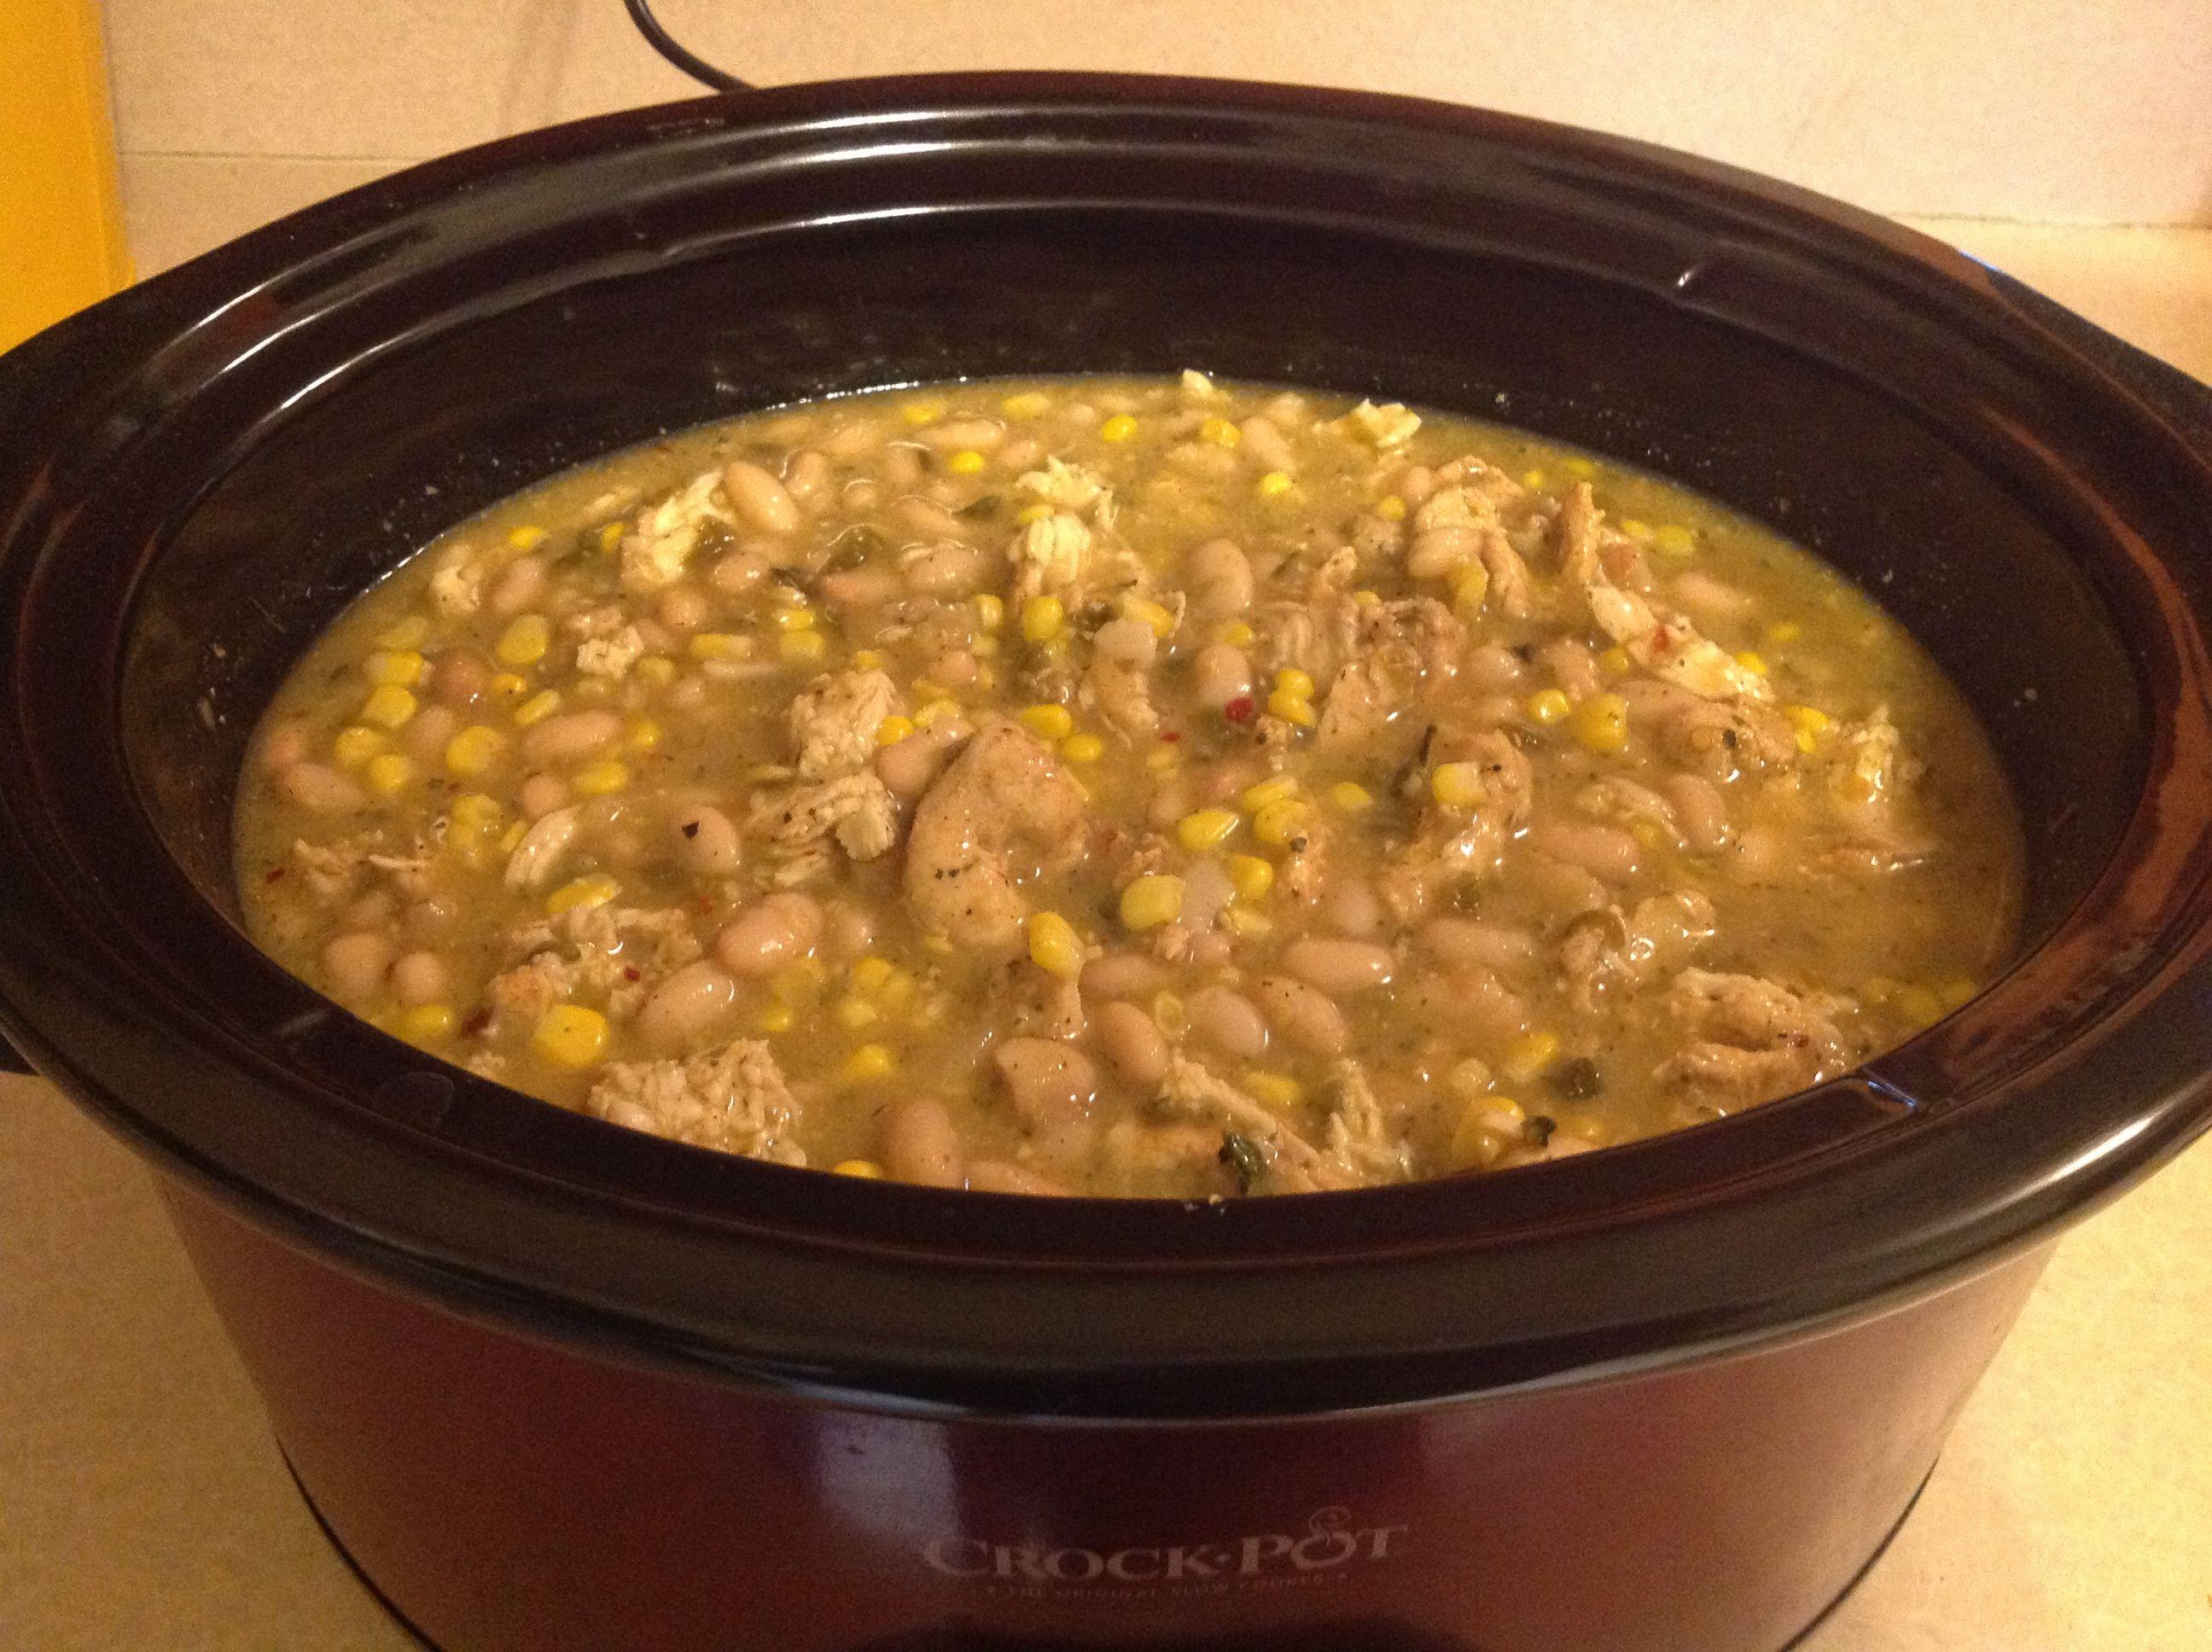 Mccormick Chili Recipe Slow Cooker